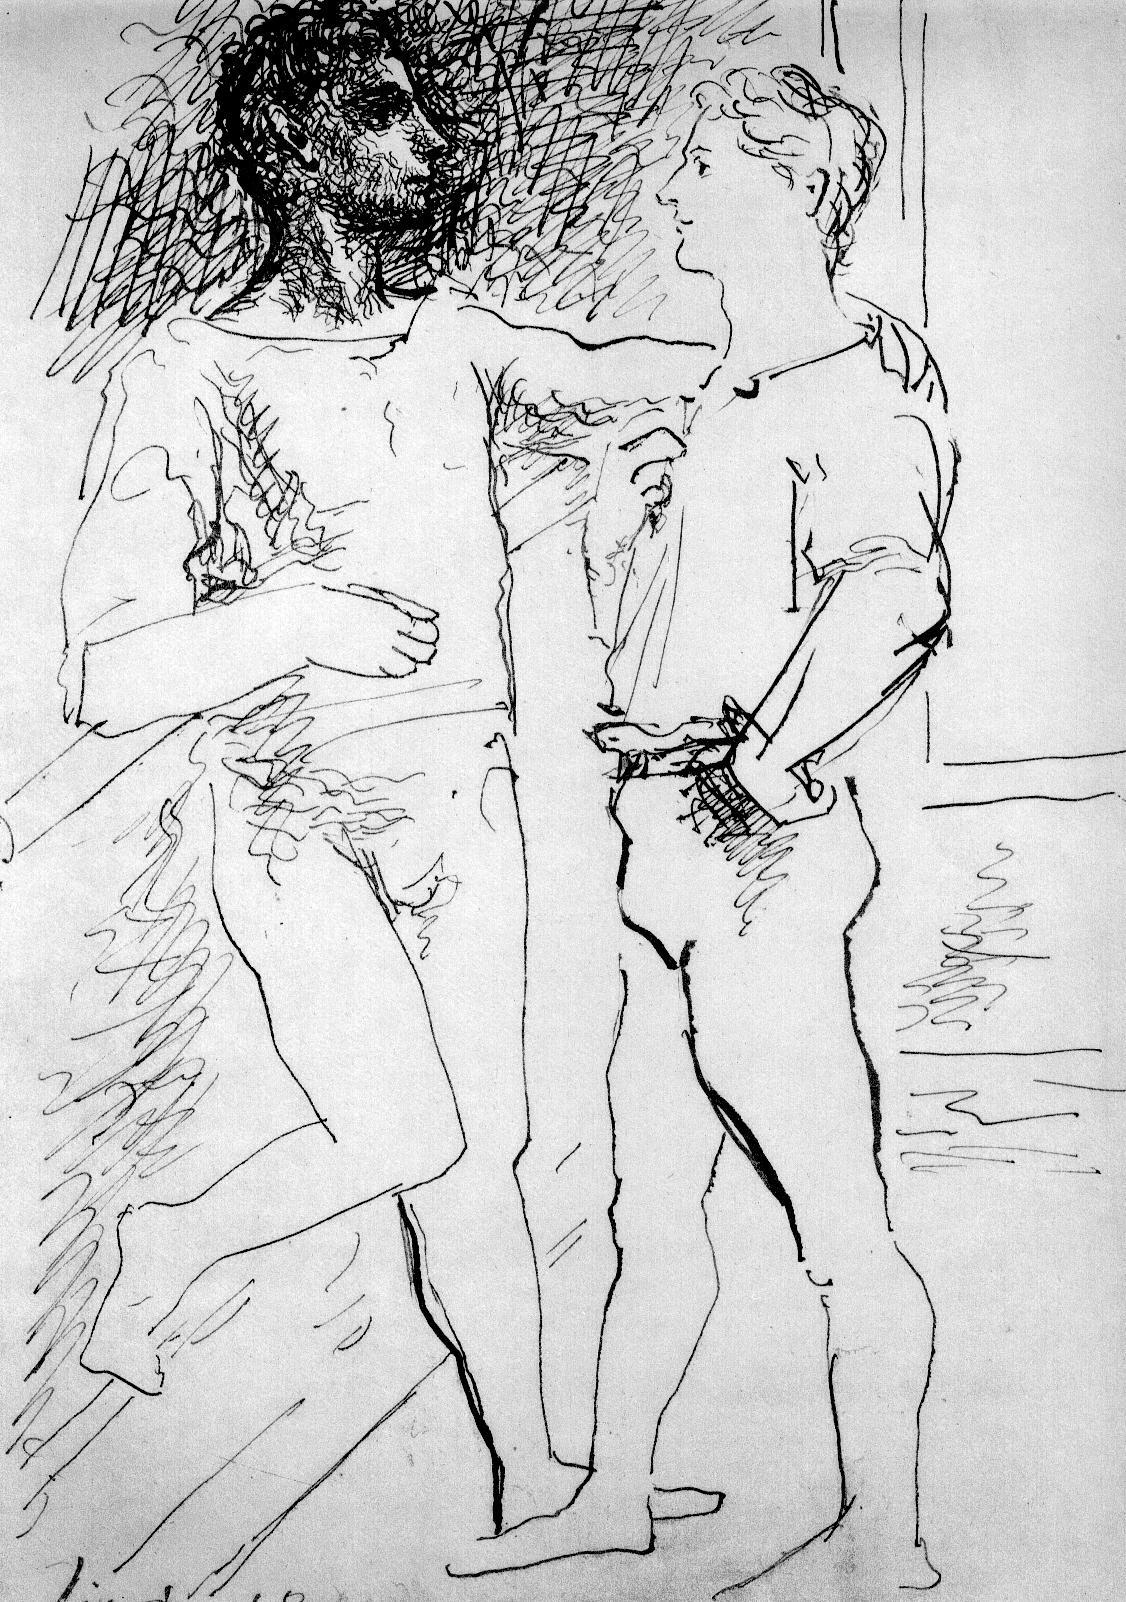 Pablo Picasso.,Belen,Madrid,Worldpride,orgullo,bailarin,male,dancer,gravados,drawings,cafe,bar,chueca